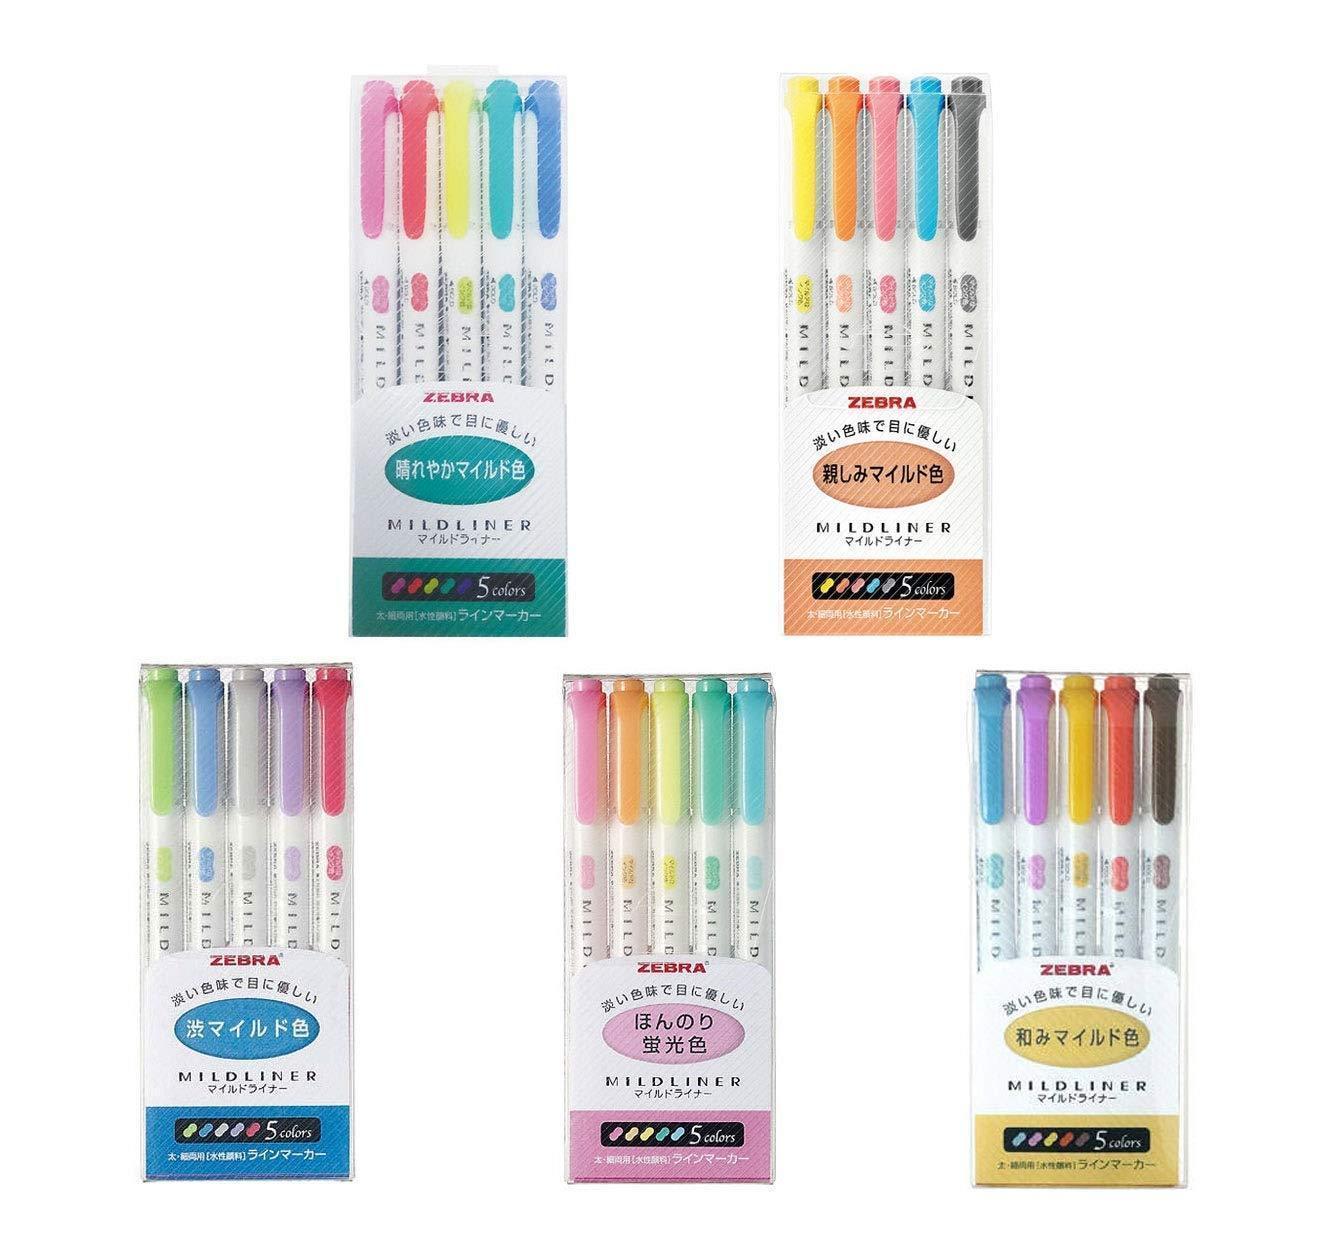 25 Colors Zebra Mildliner Double Sided Highlighter Pen Set 5 Type Japanese Stationery